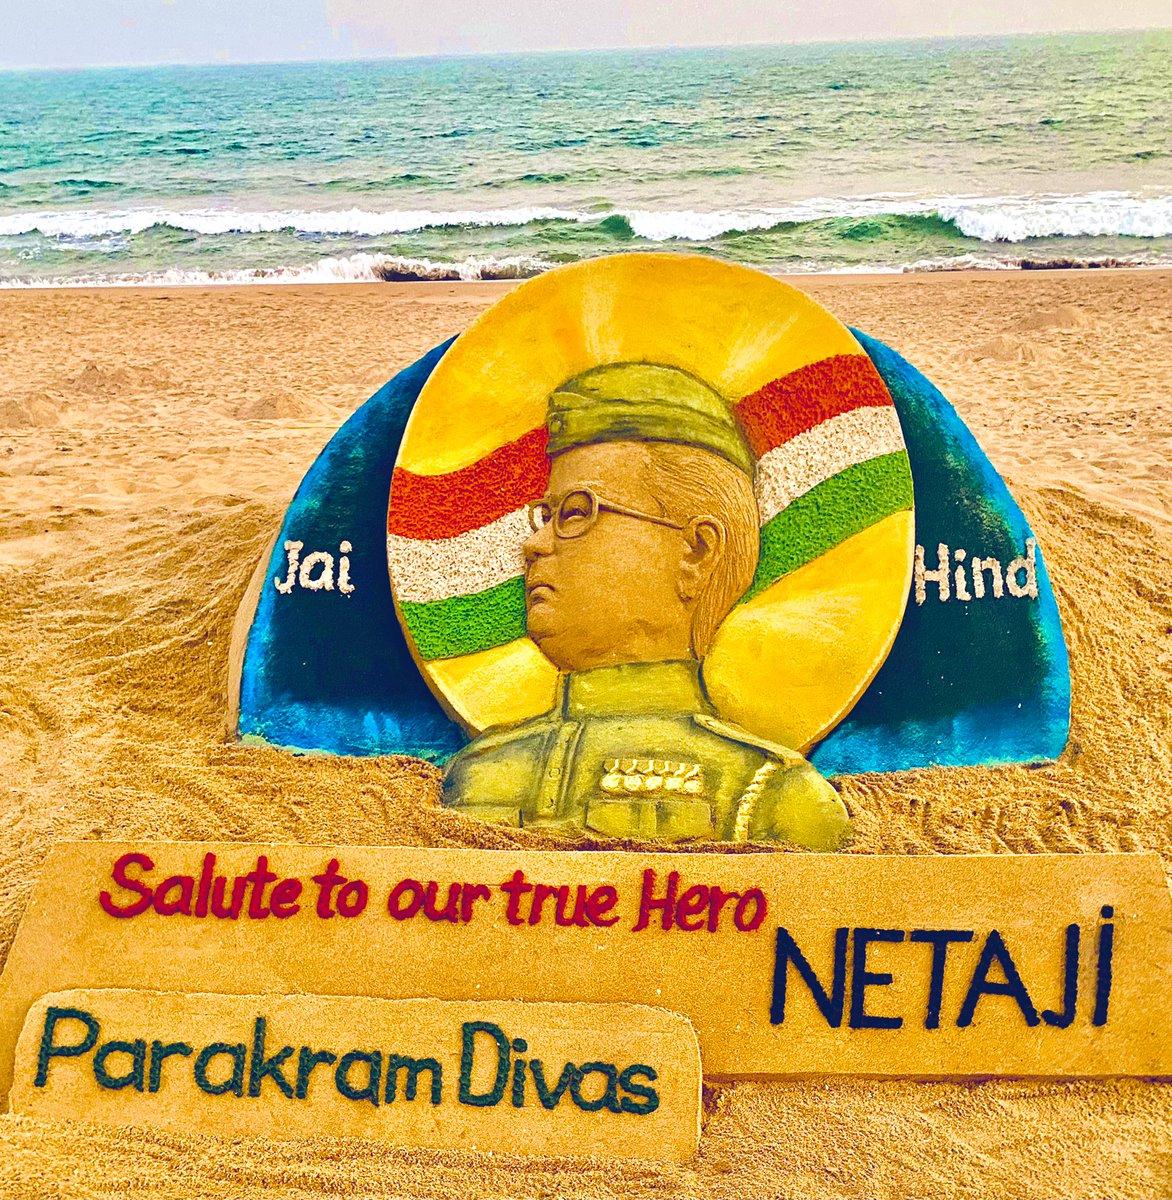 Tributes to the brave #NetajiSubhasChandraBose on #ParakramDivas My SandArt at Puri beach in Odisha.